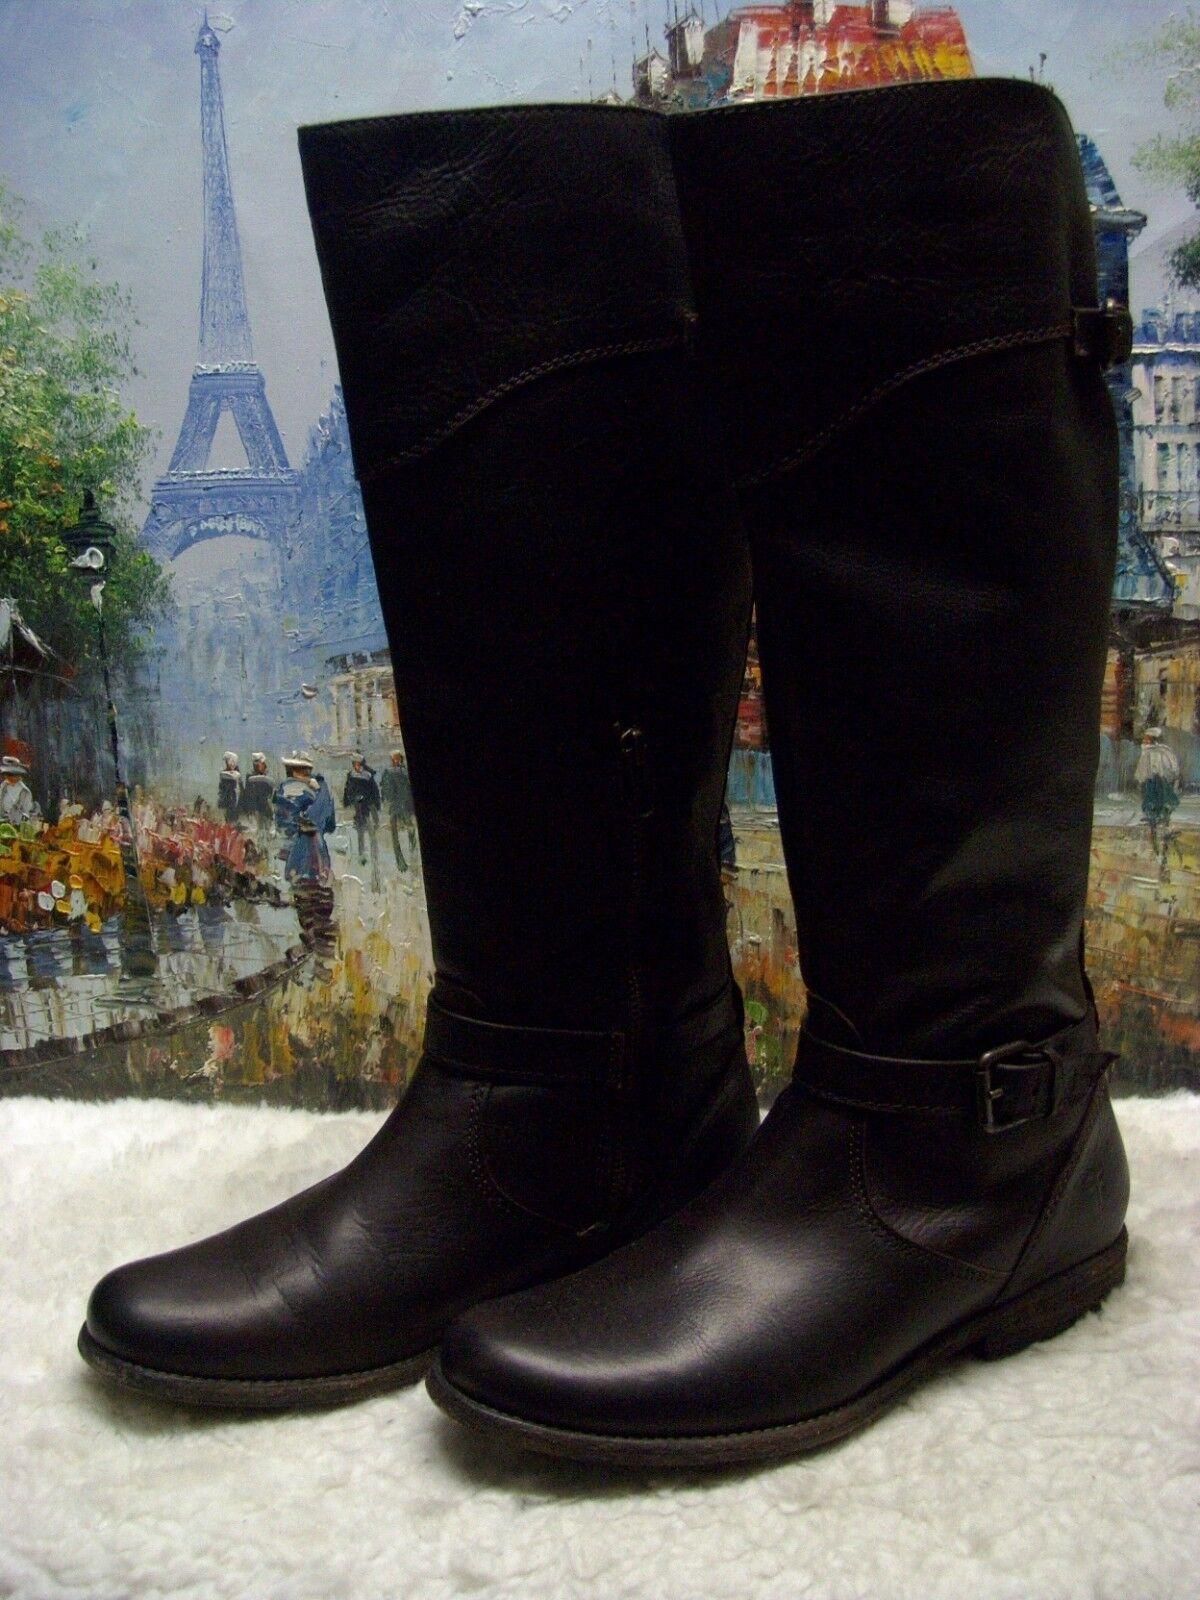 Frye Phillip Riding Boots - Size 9.5B -  398